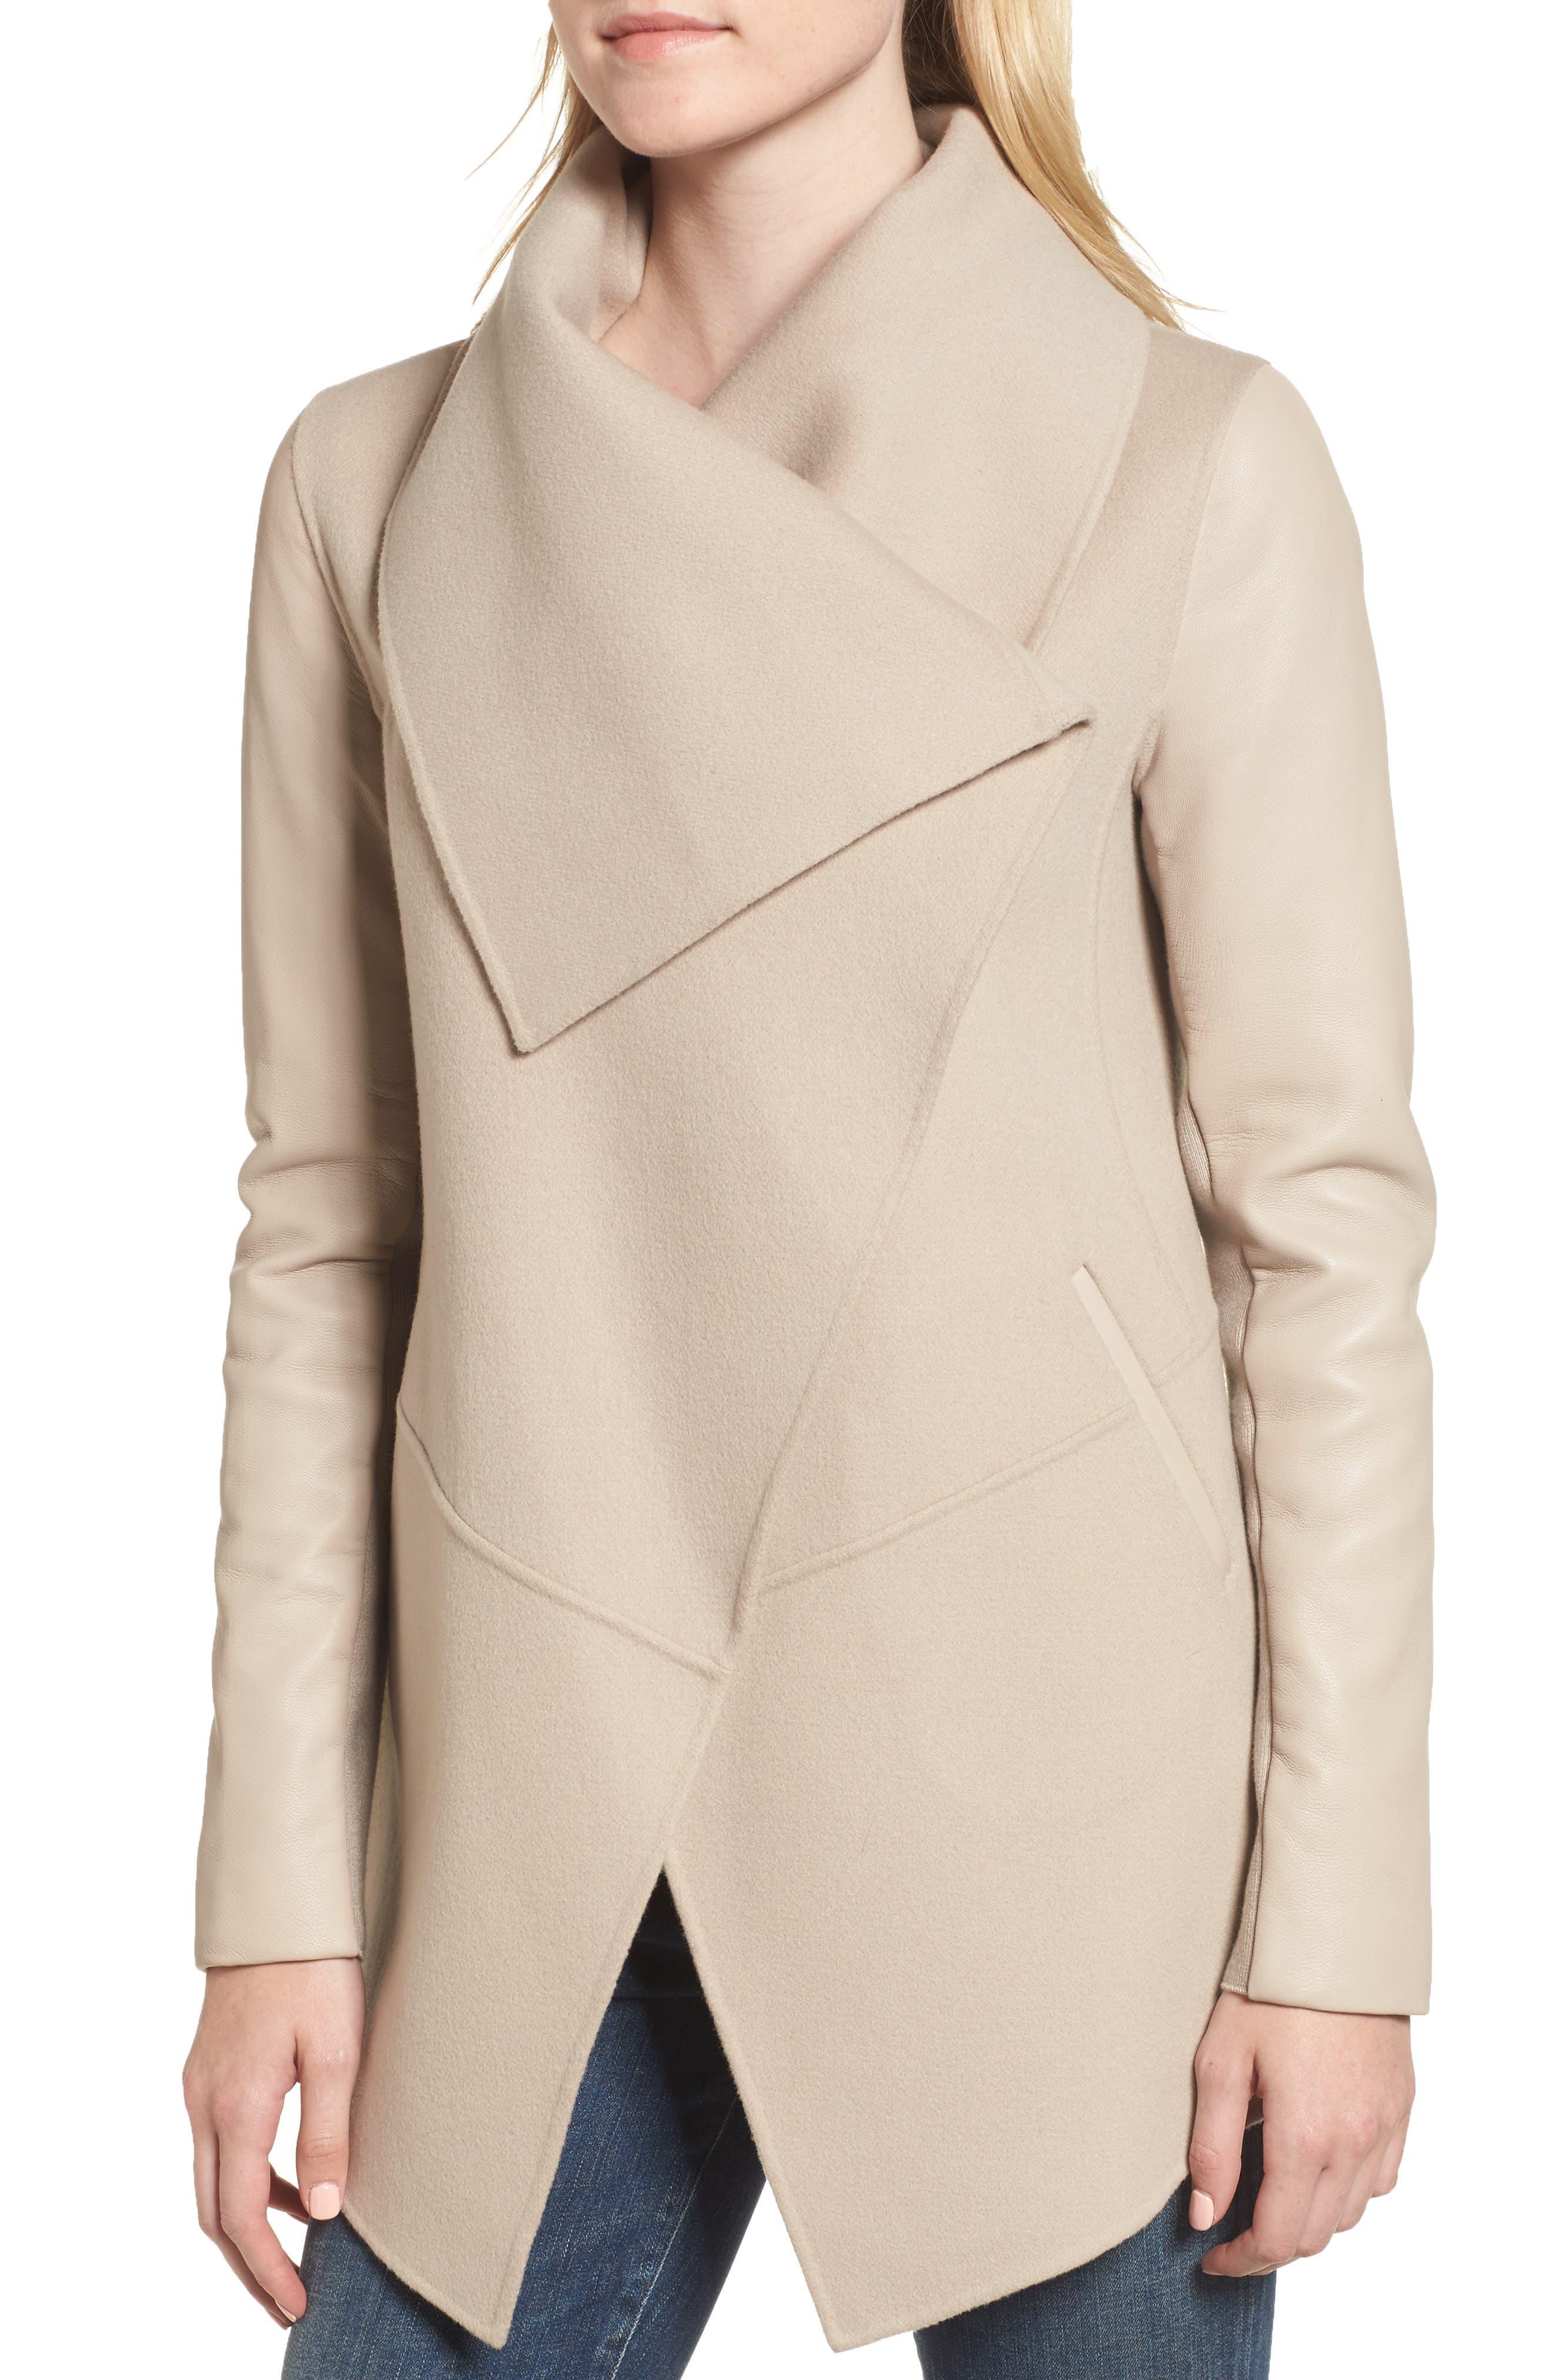 Vane Asymmetrical Leather Sleeve Coat,                             Alternate thumbnail 4, color,                             Sand